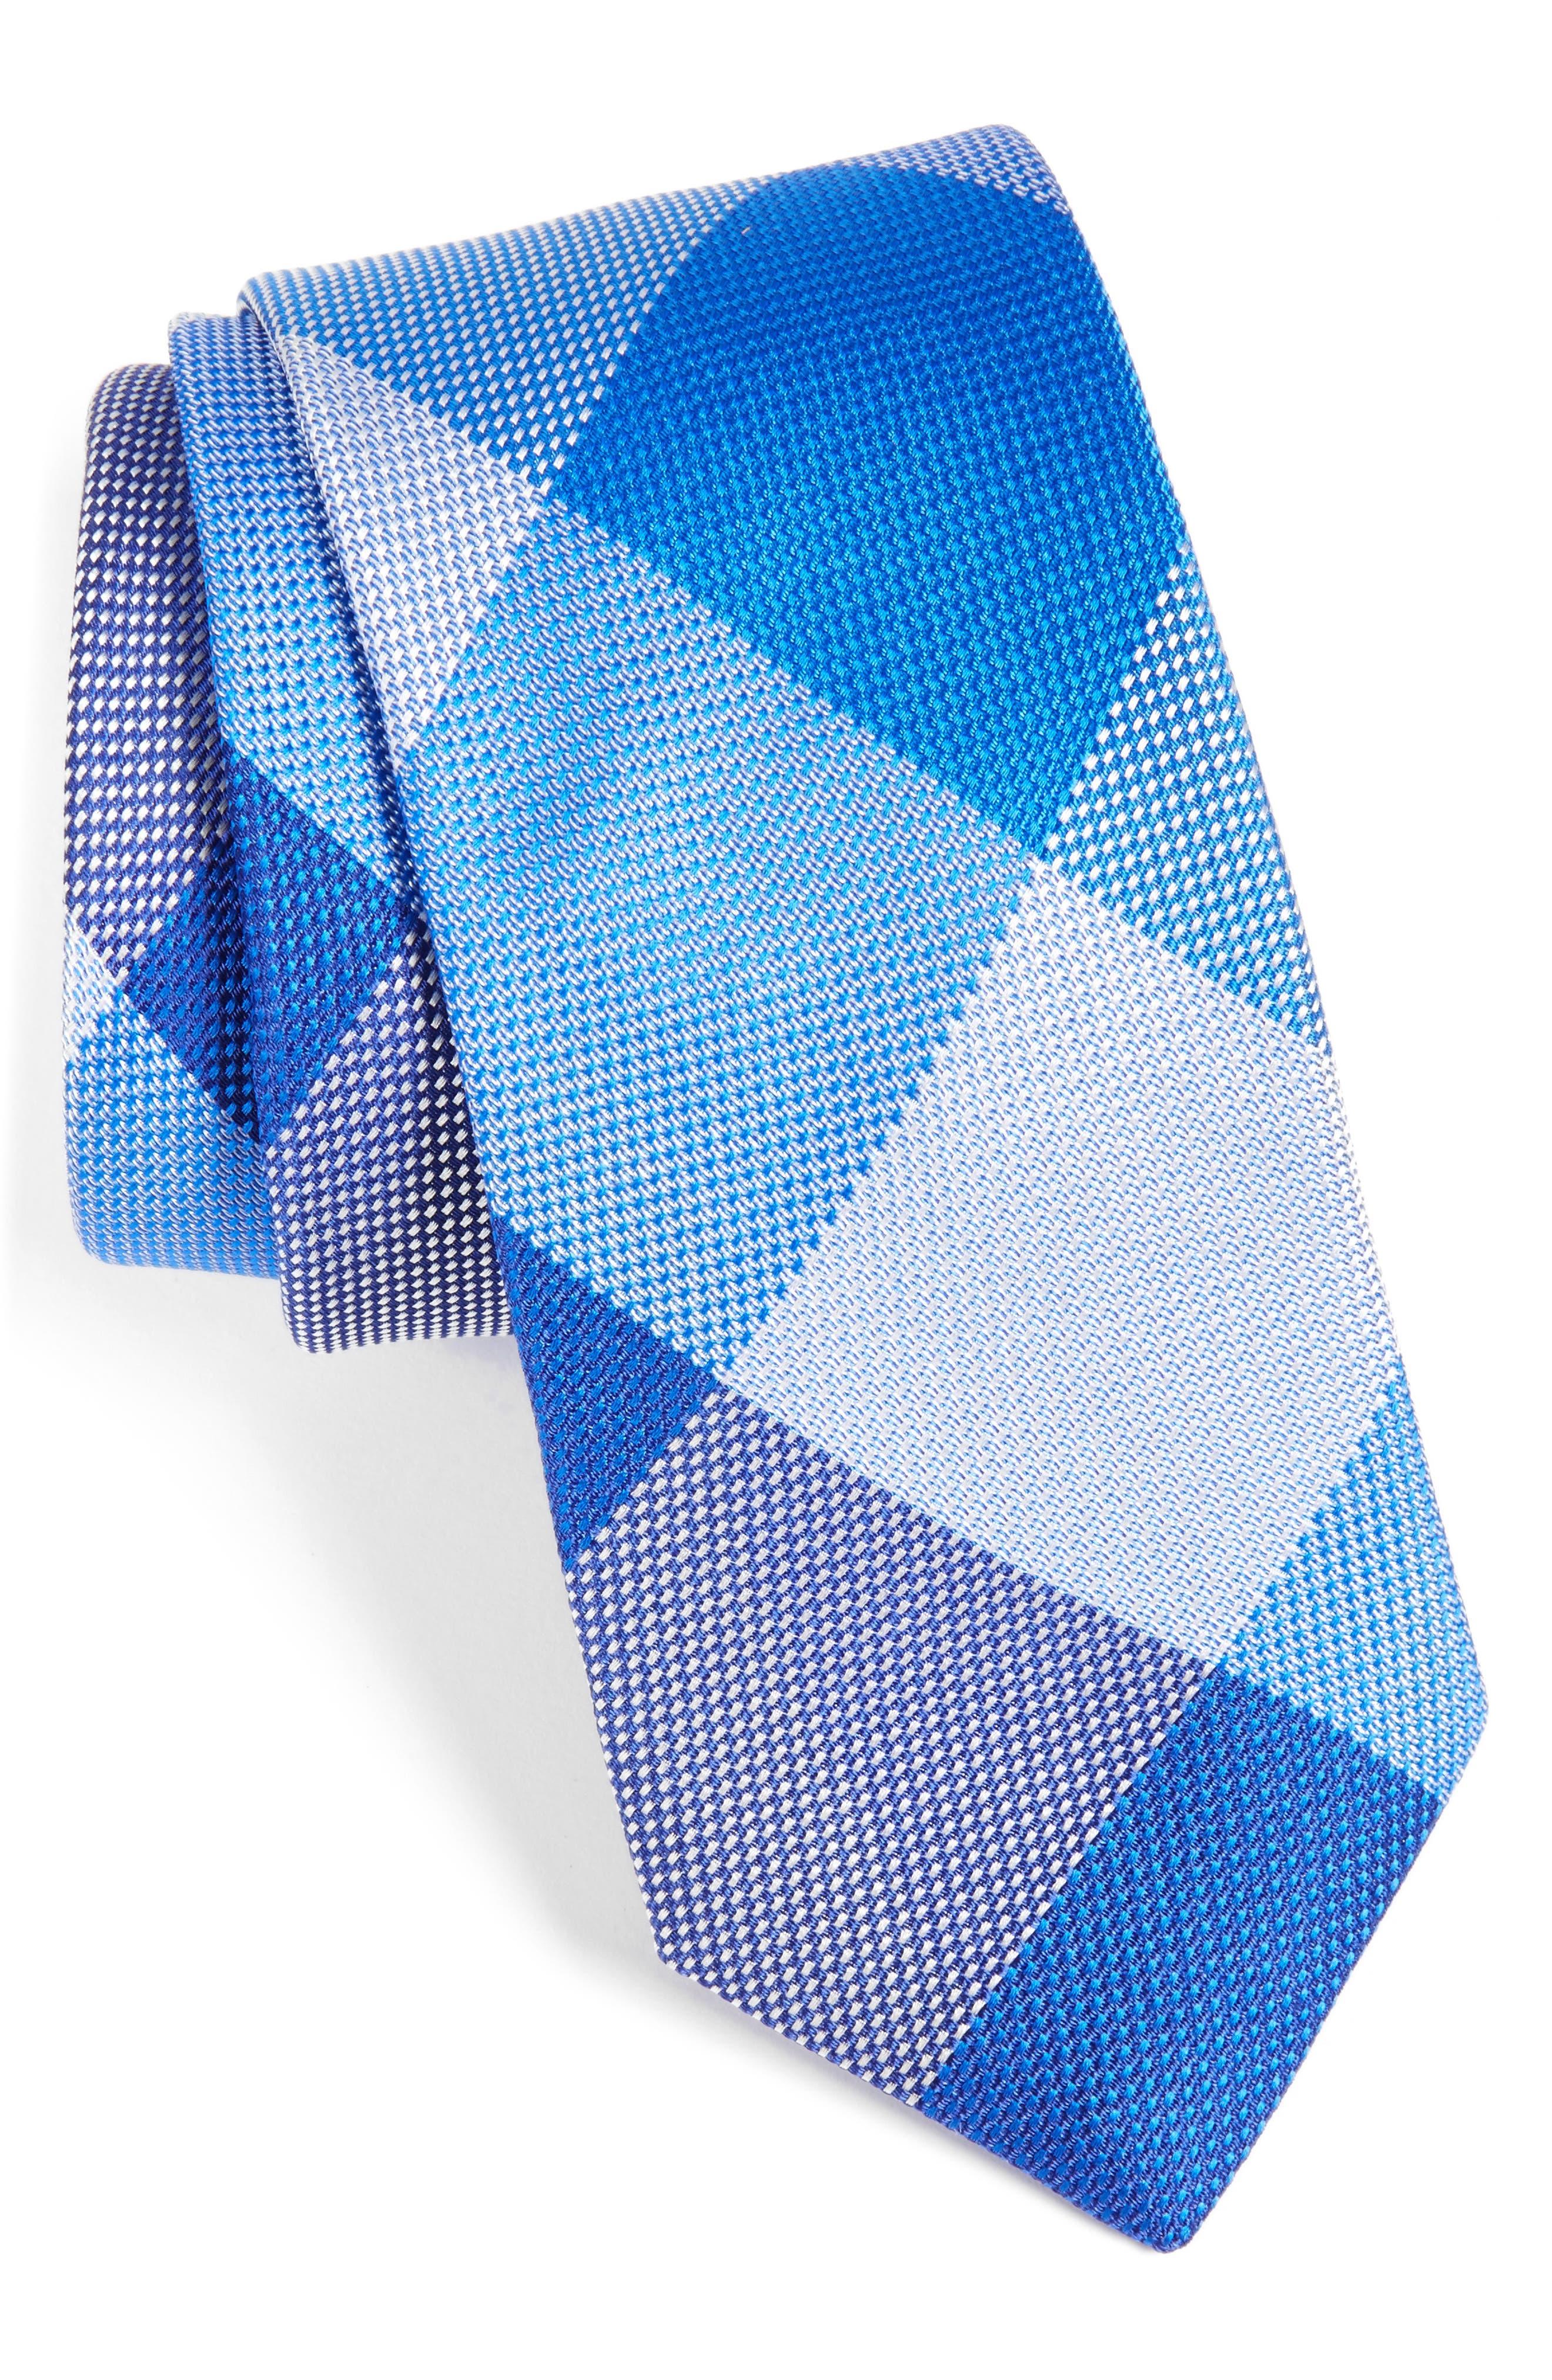 Plaid Silk Tie,                         Main,                         color, 400